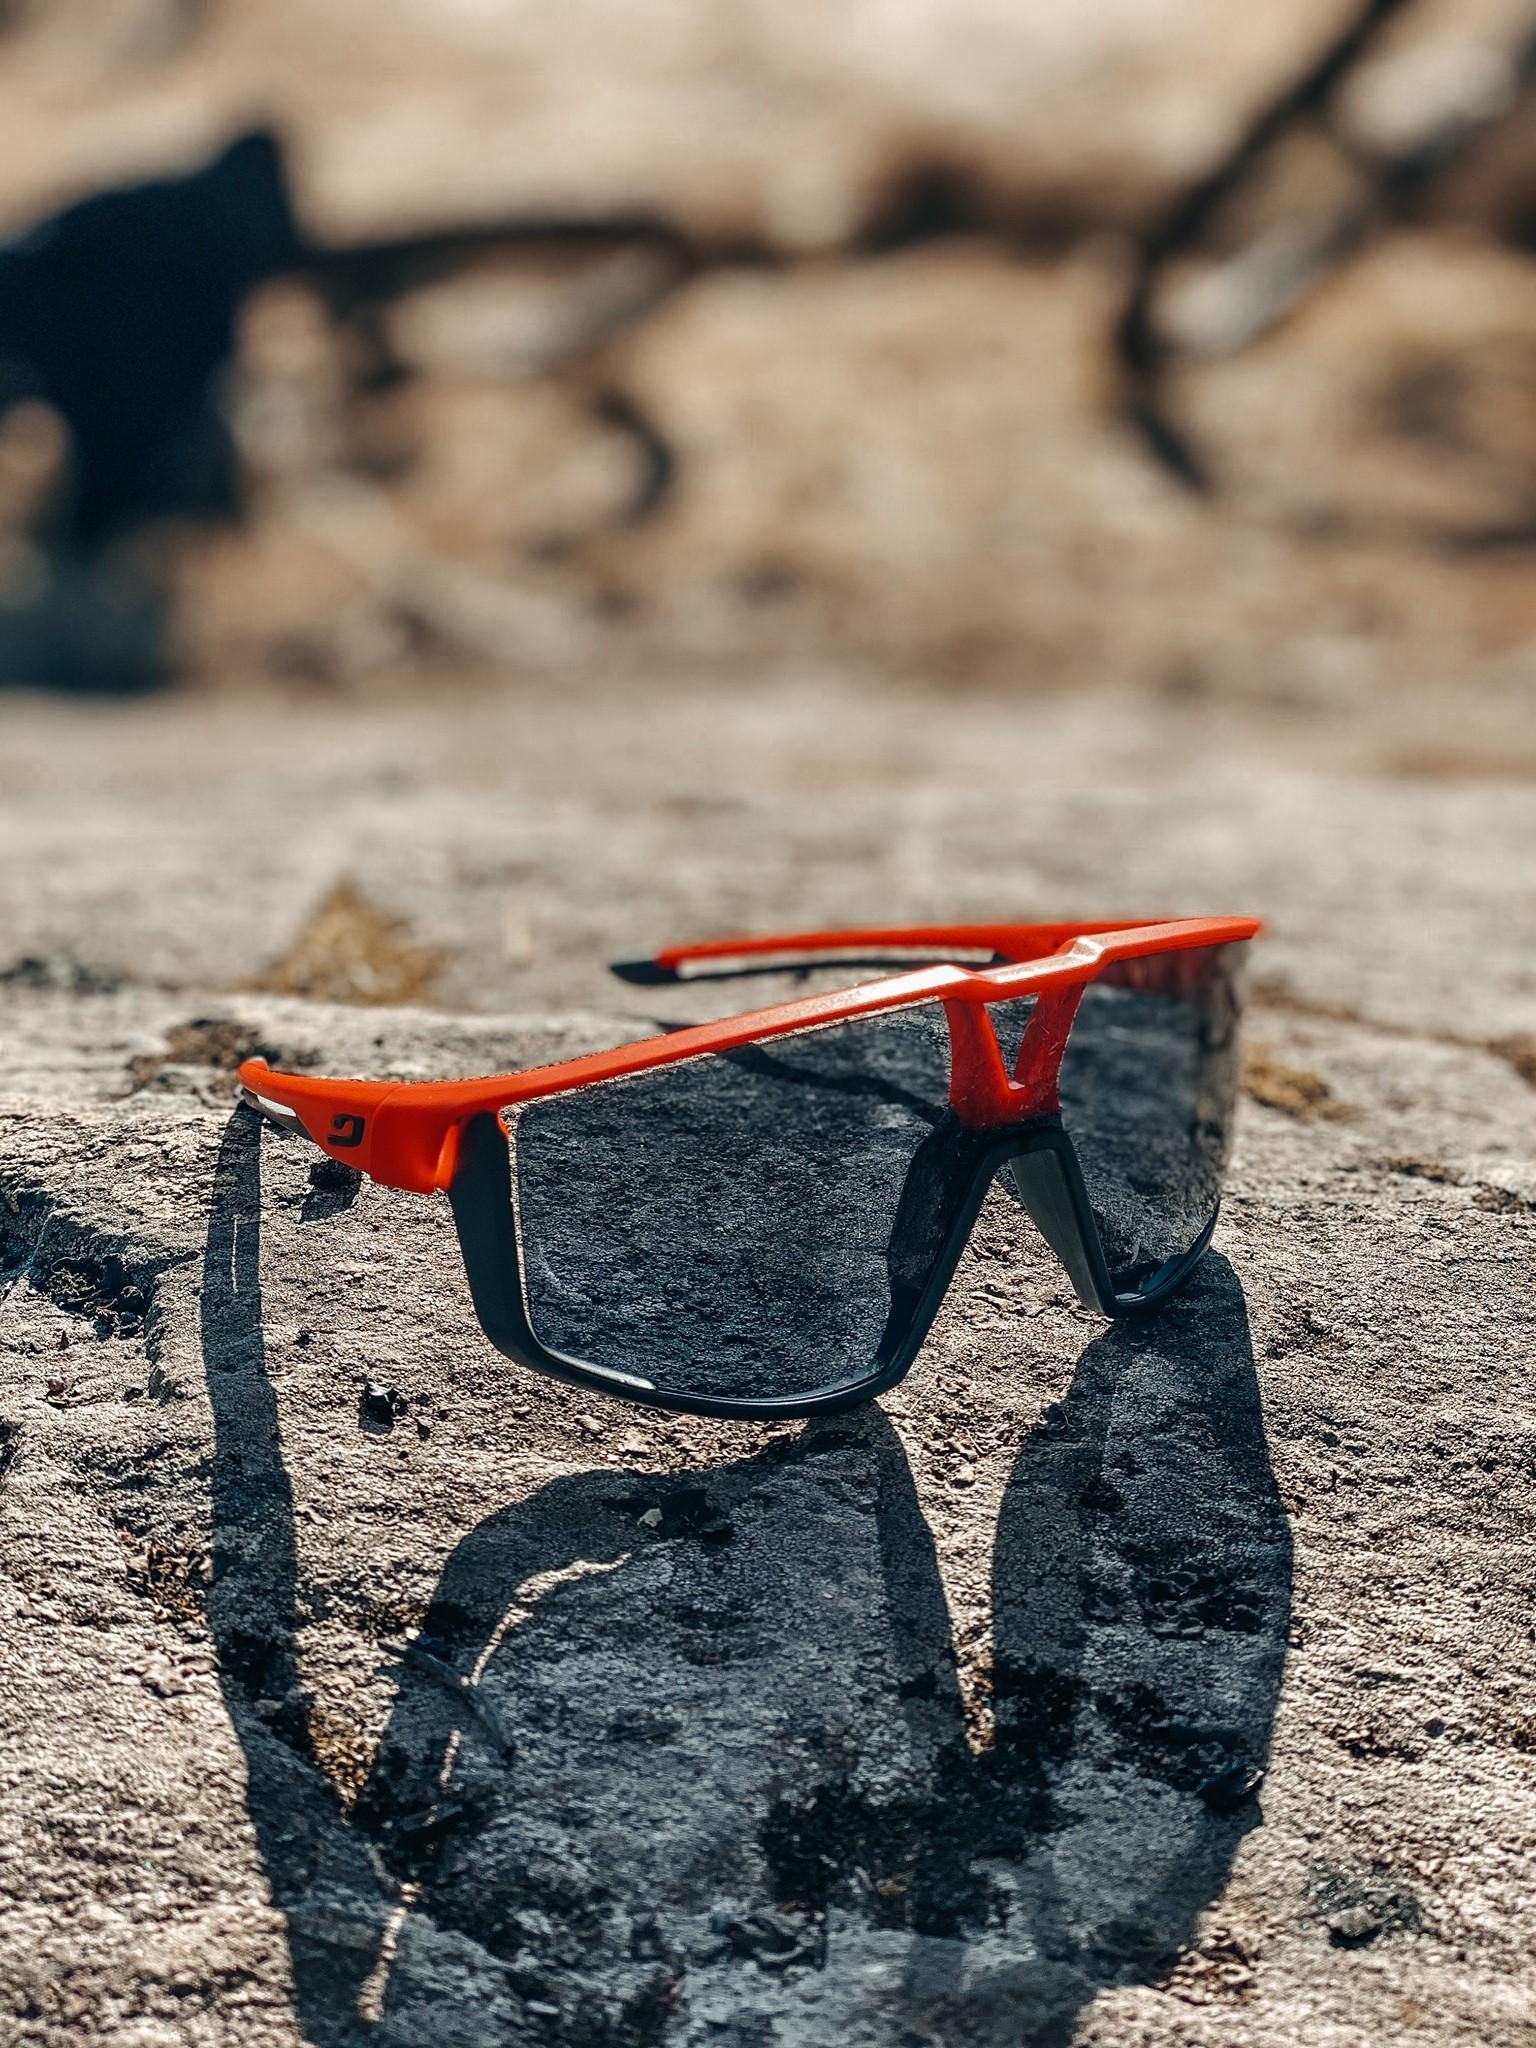 julbo-zonnebril-sportief-optiekmichiel